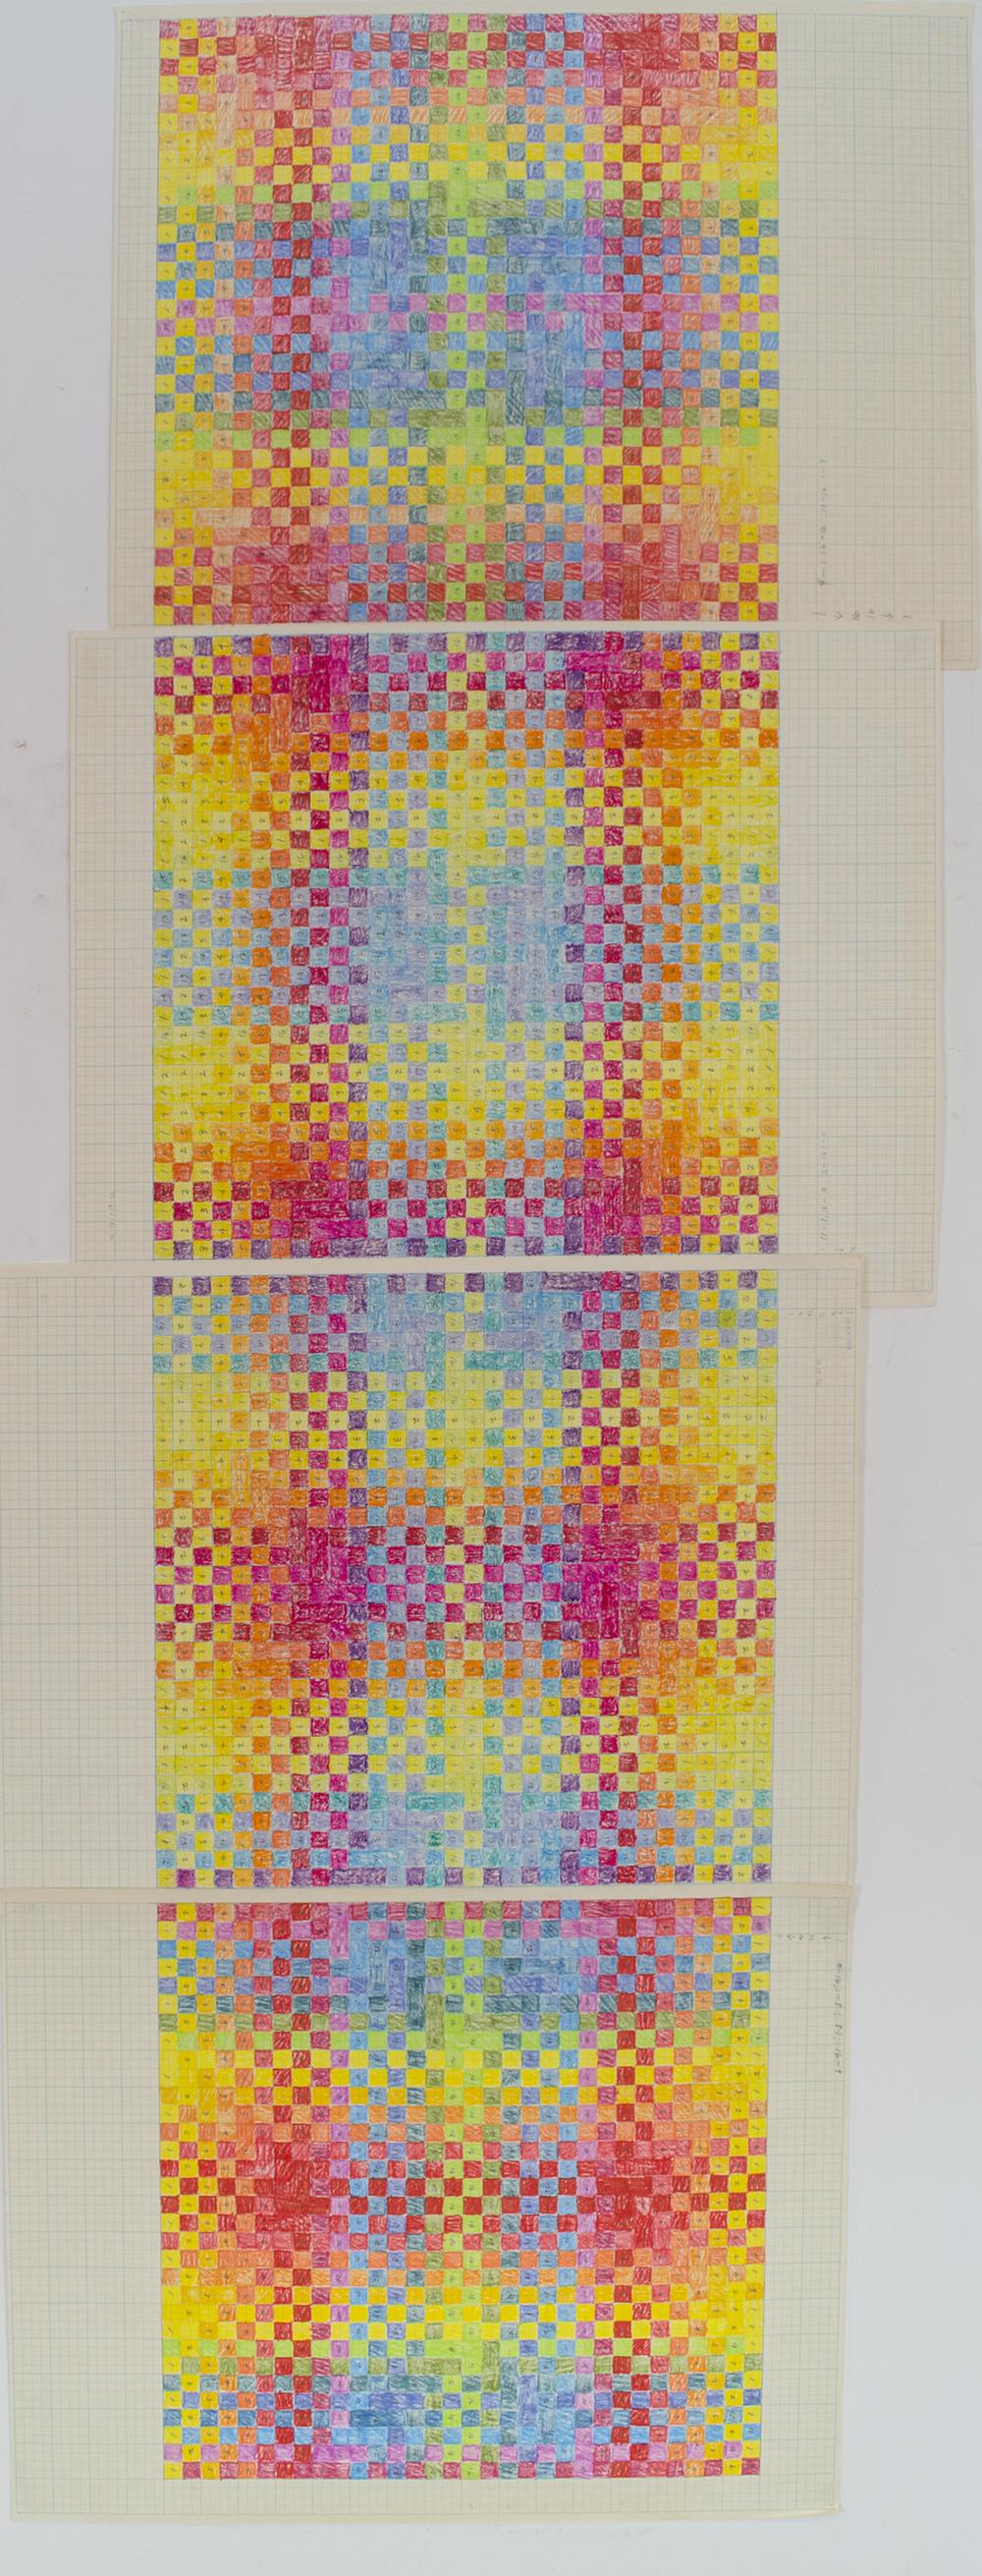 STUDY-WEAVE ROOM 4,5,67,8 1973 ©